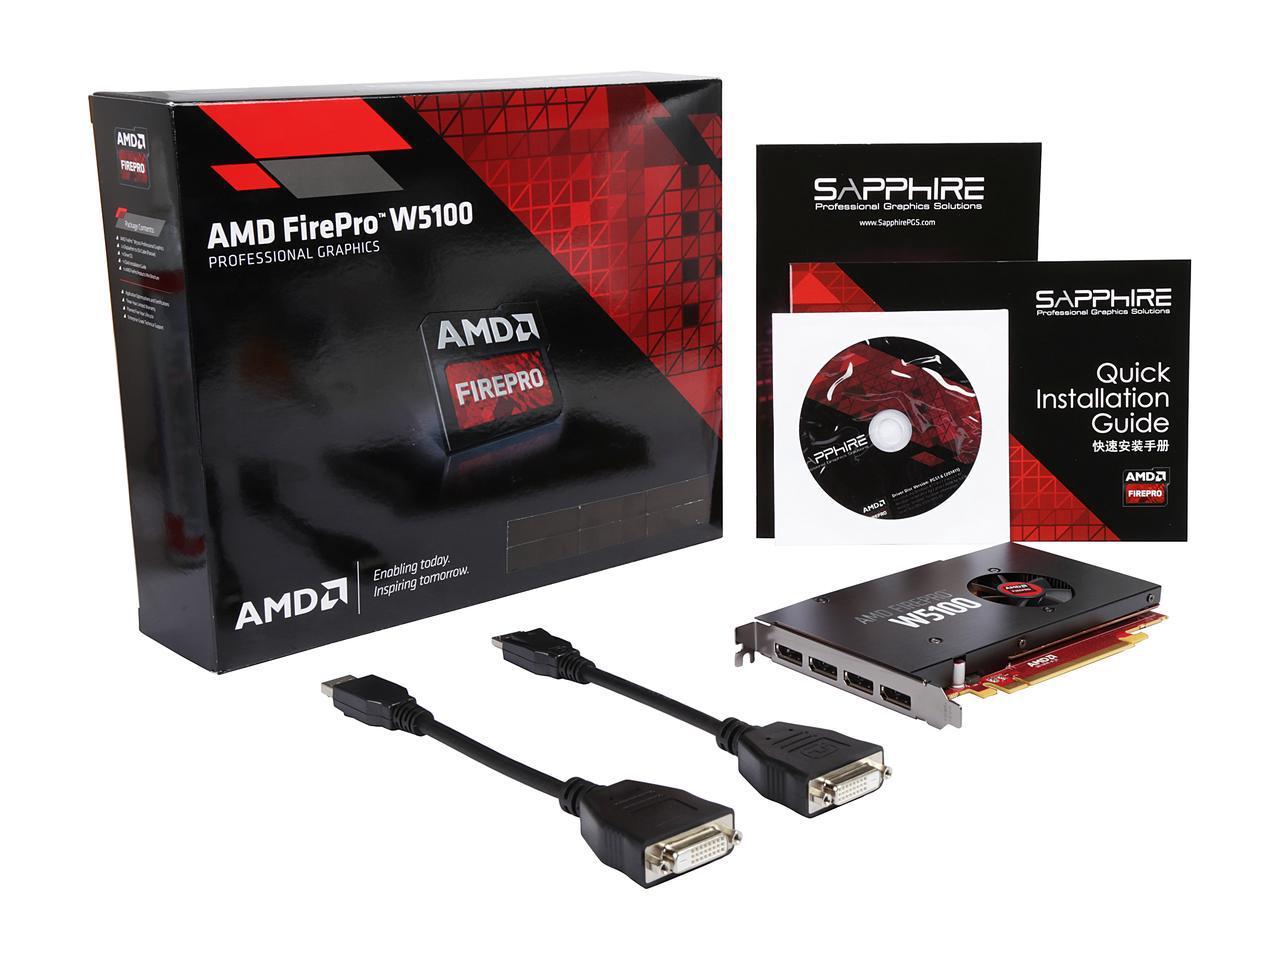 AMD FirePro W5100 - 4GB GDDR5, 4-DP, PCIe 3.0